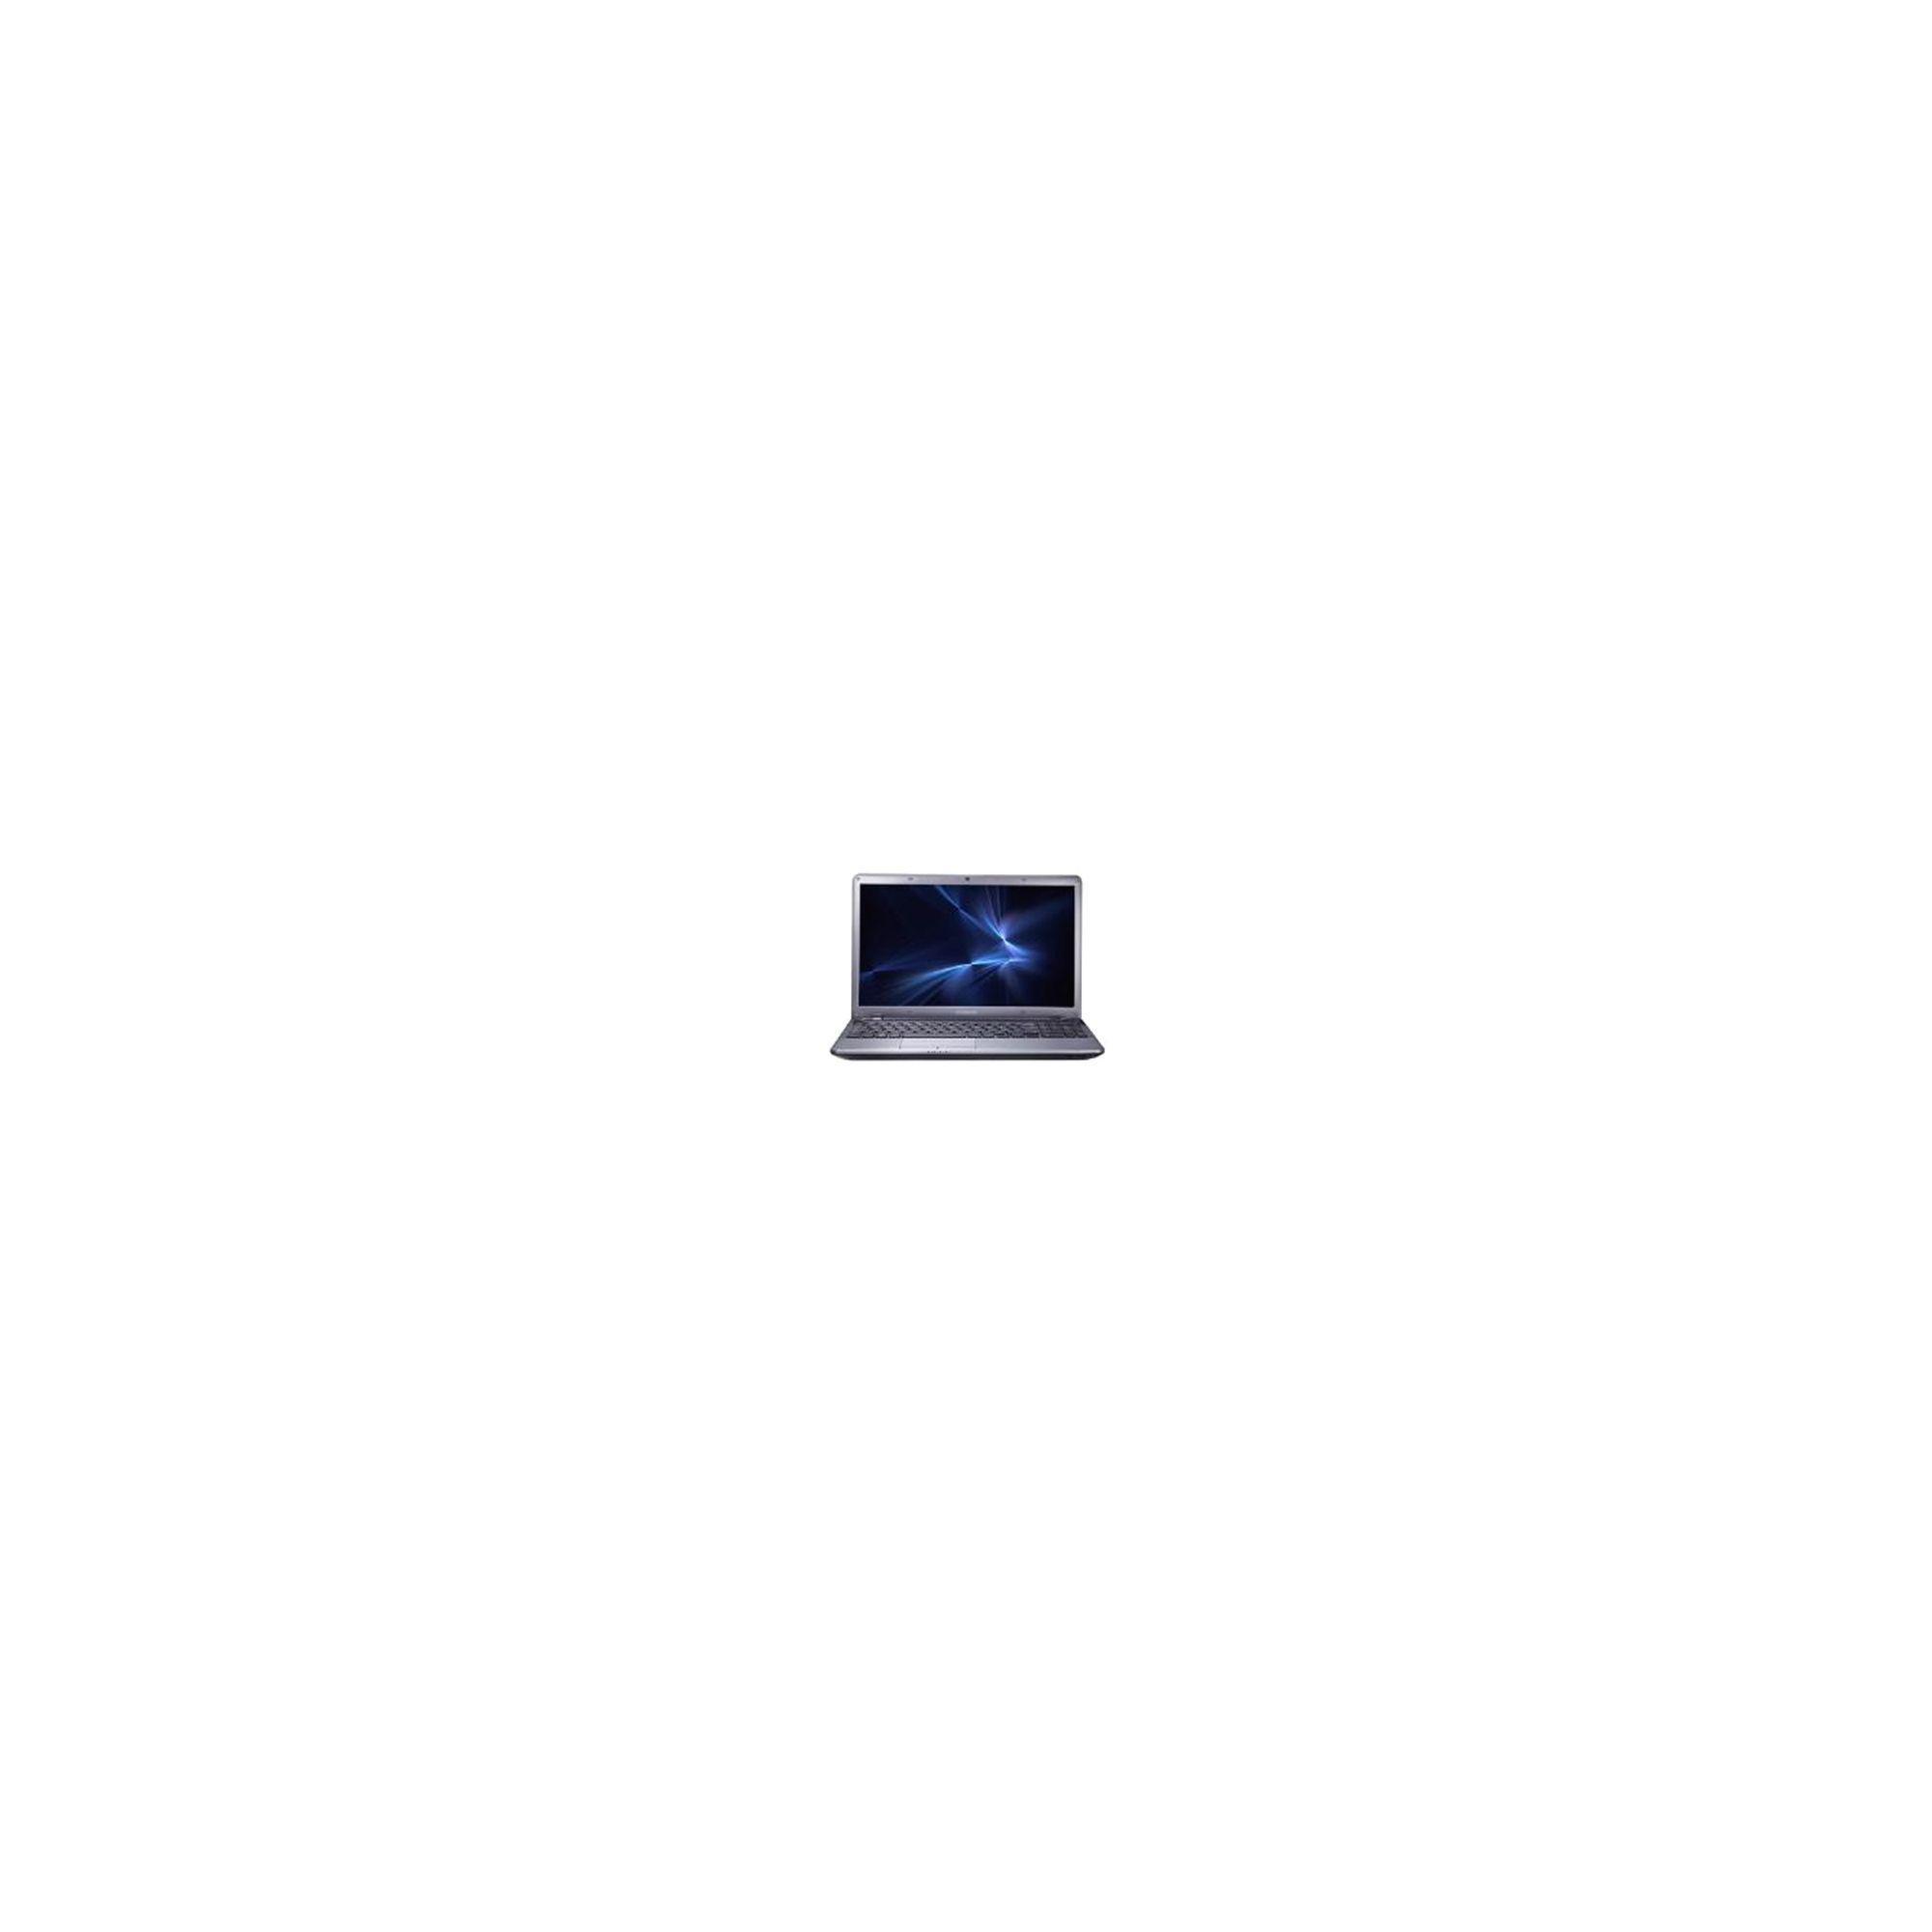 Samsung Series 3 350V (15.6 inch) Notebook Core i7 (3630QM) 2.4GHz 4GB 500GB SuperMulti DL WLAN BT Webcam Windows 7 Pro (64-bit) HD Graphics 4000 at Tesco Direct